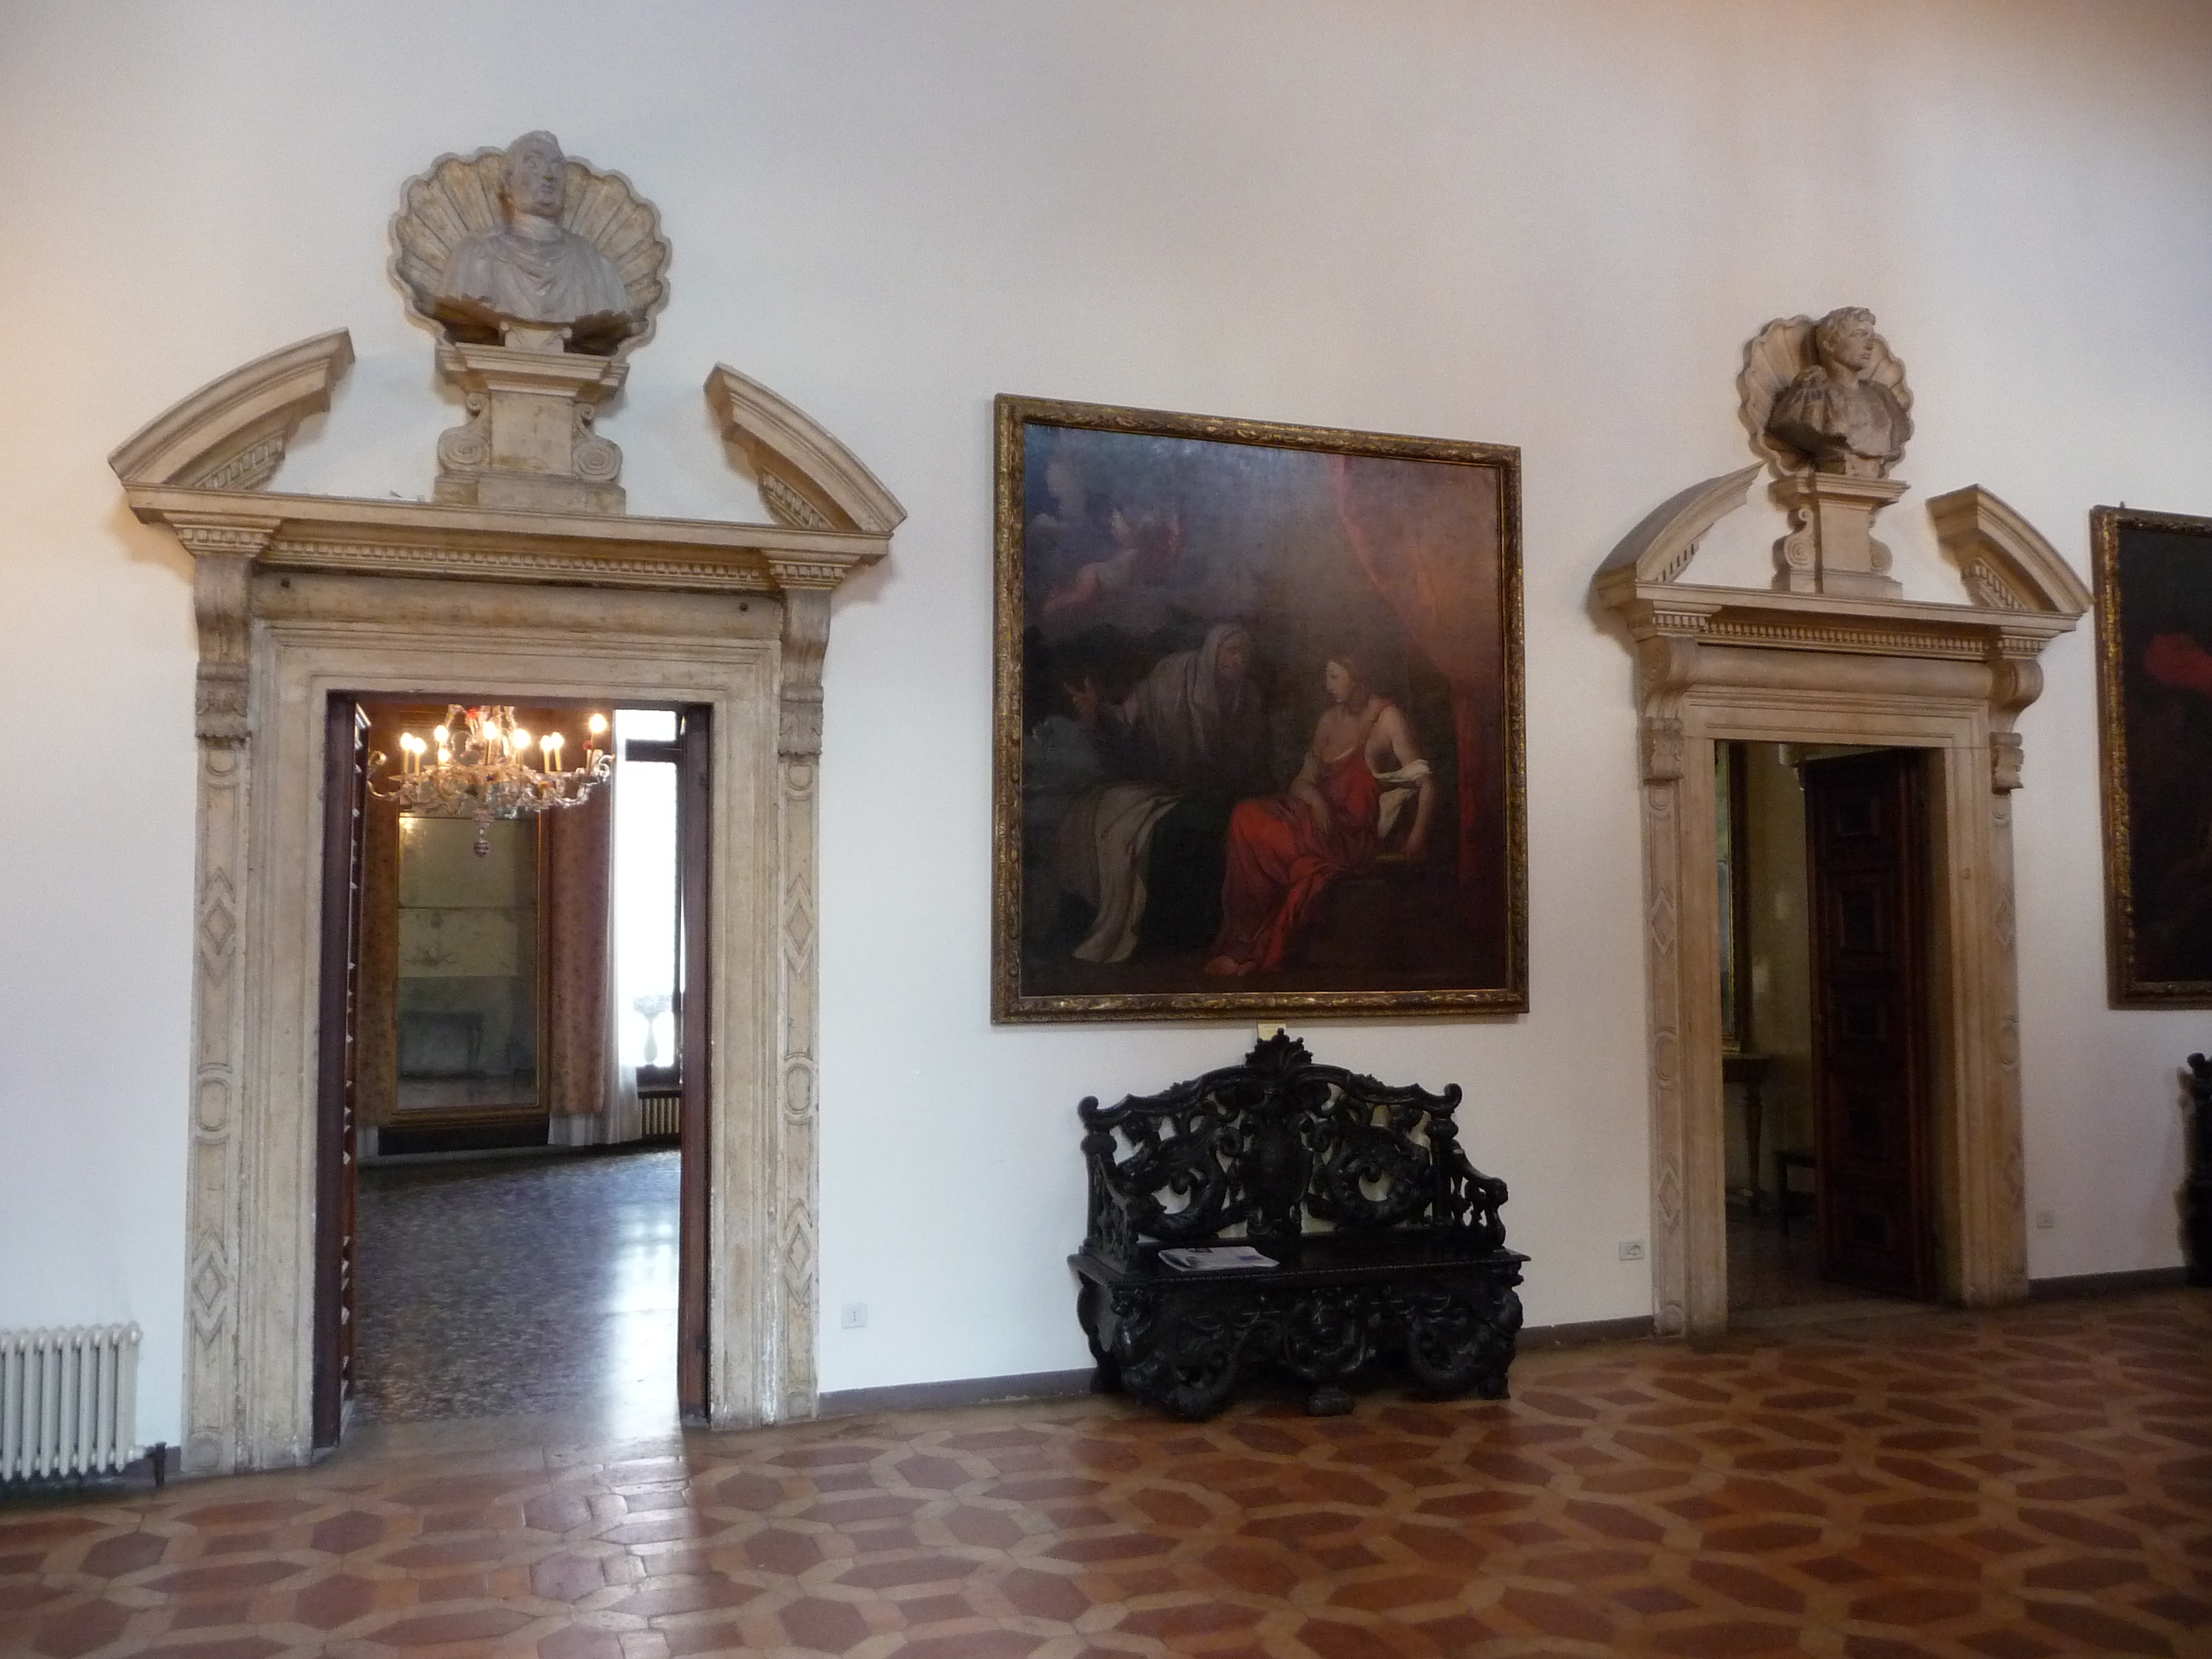 Palazzo_Valmarana_Vicenza_salone_2009-07-25_f04.jpg